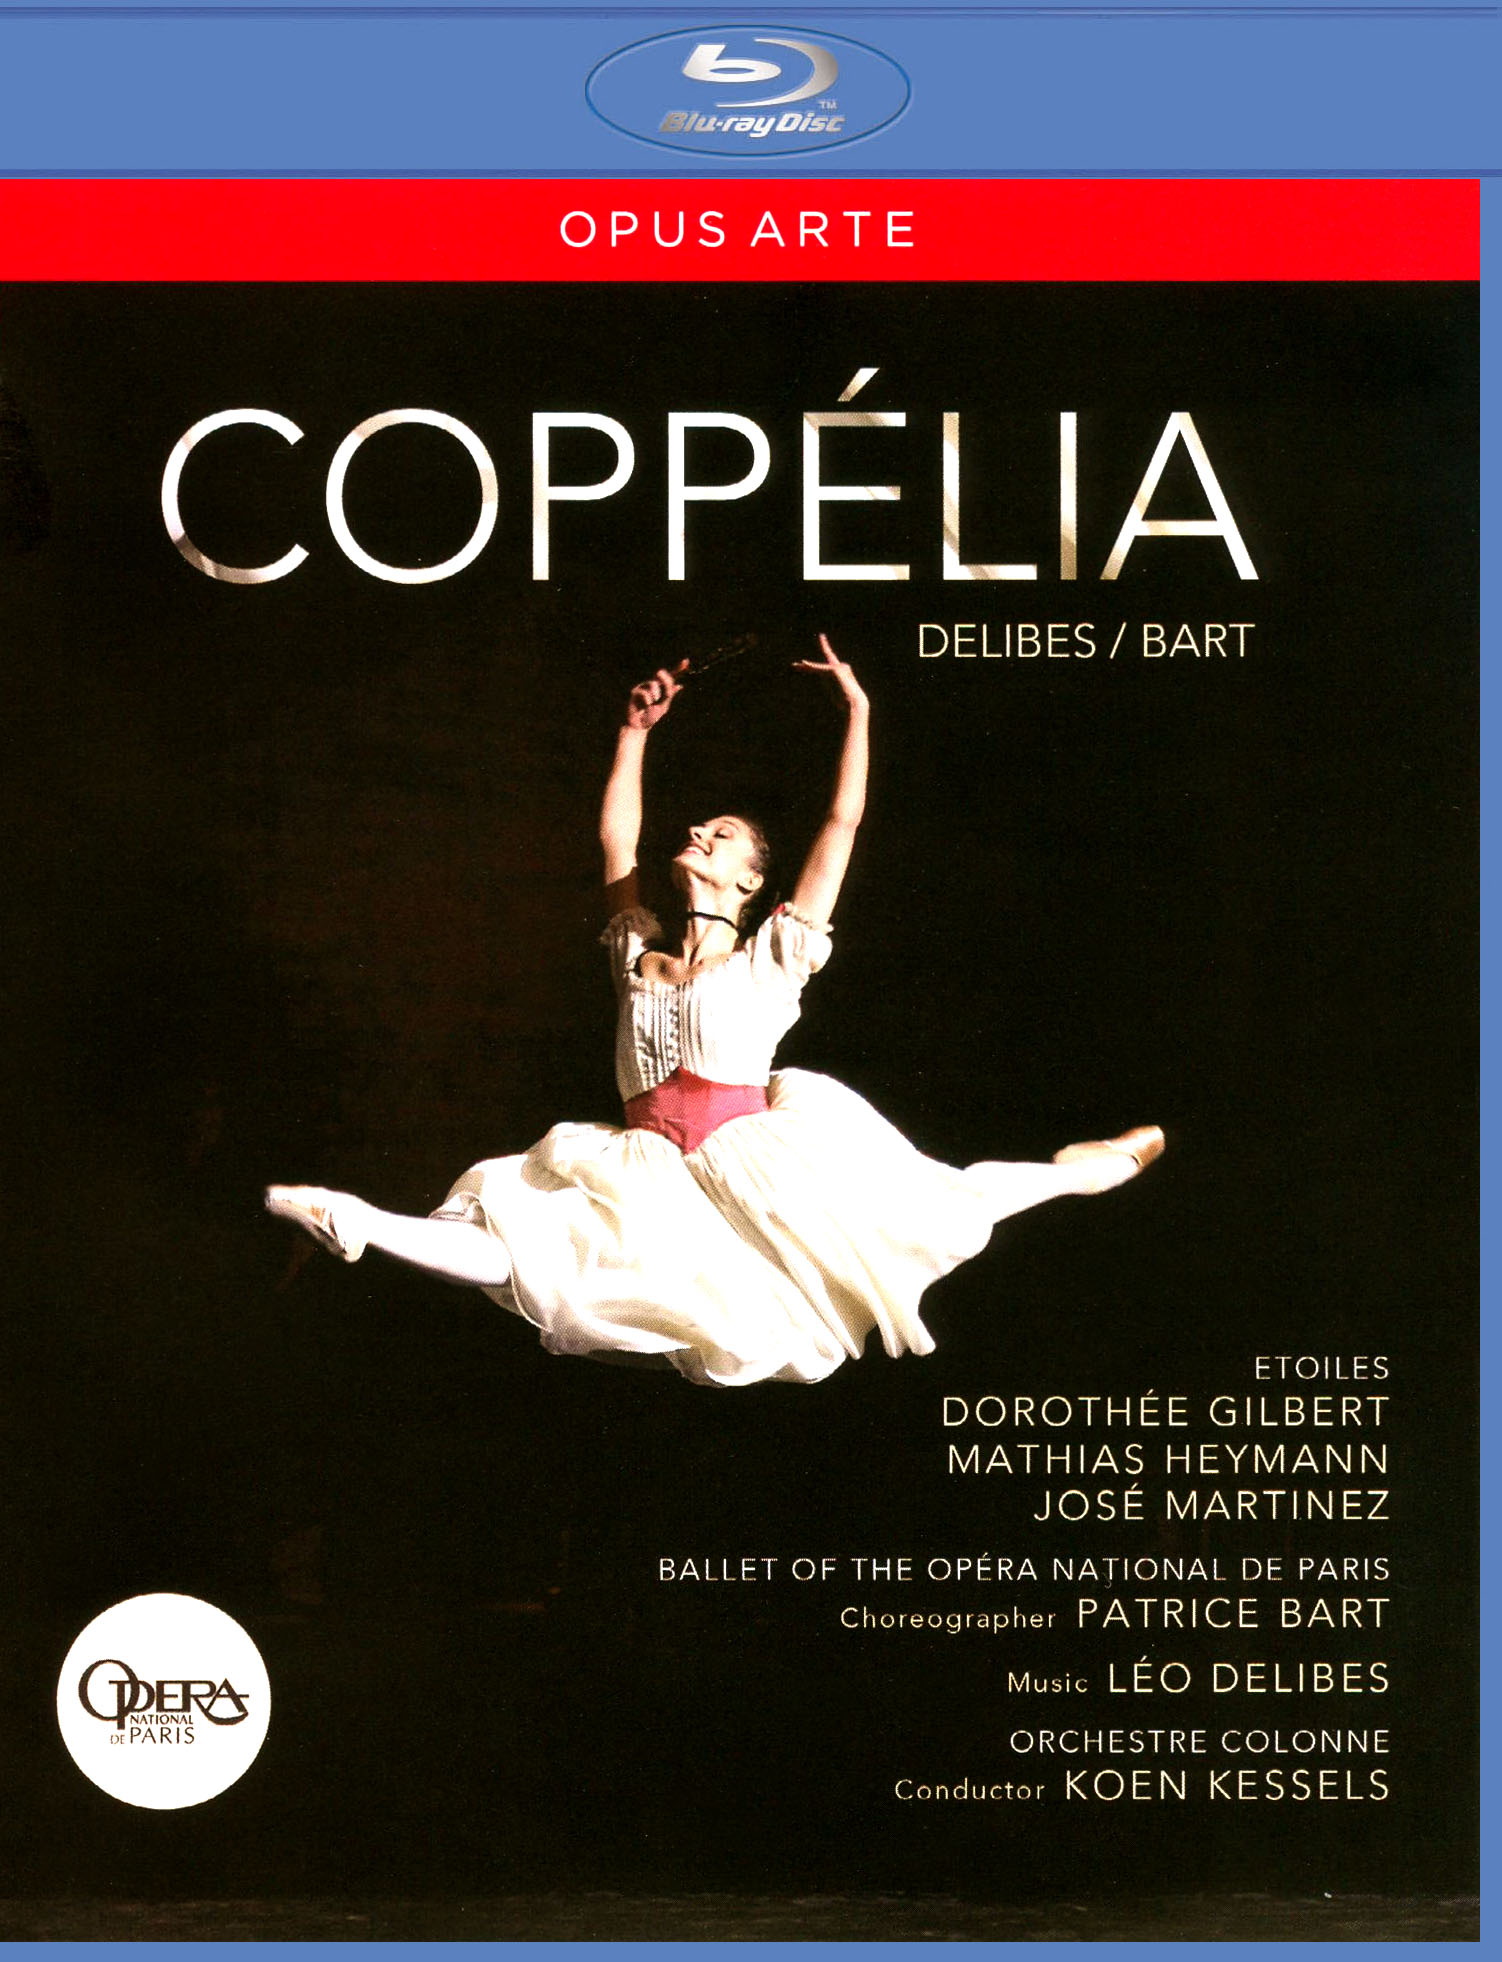 Coppelia (Ballet of the Opera National de Paris)